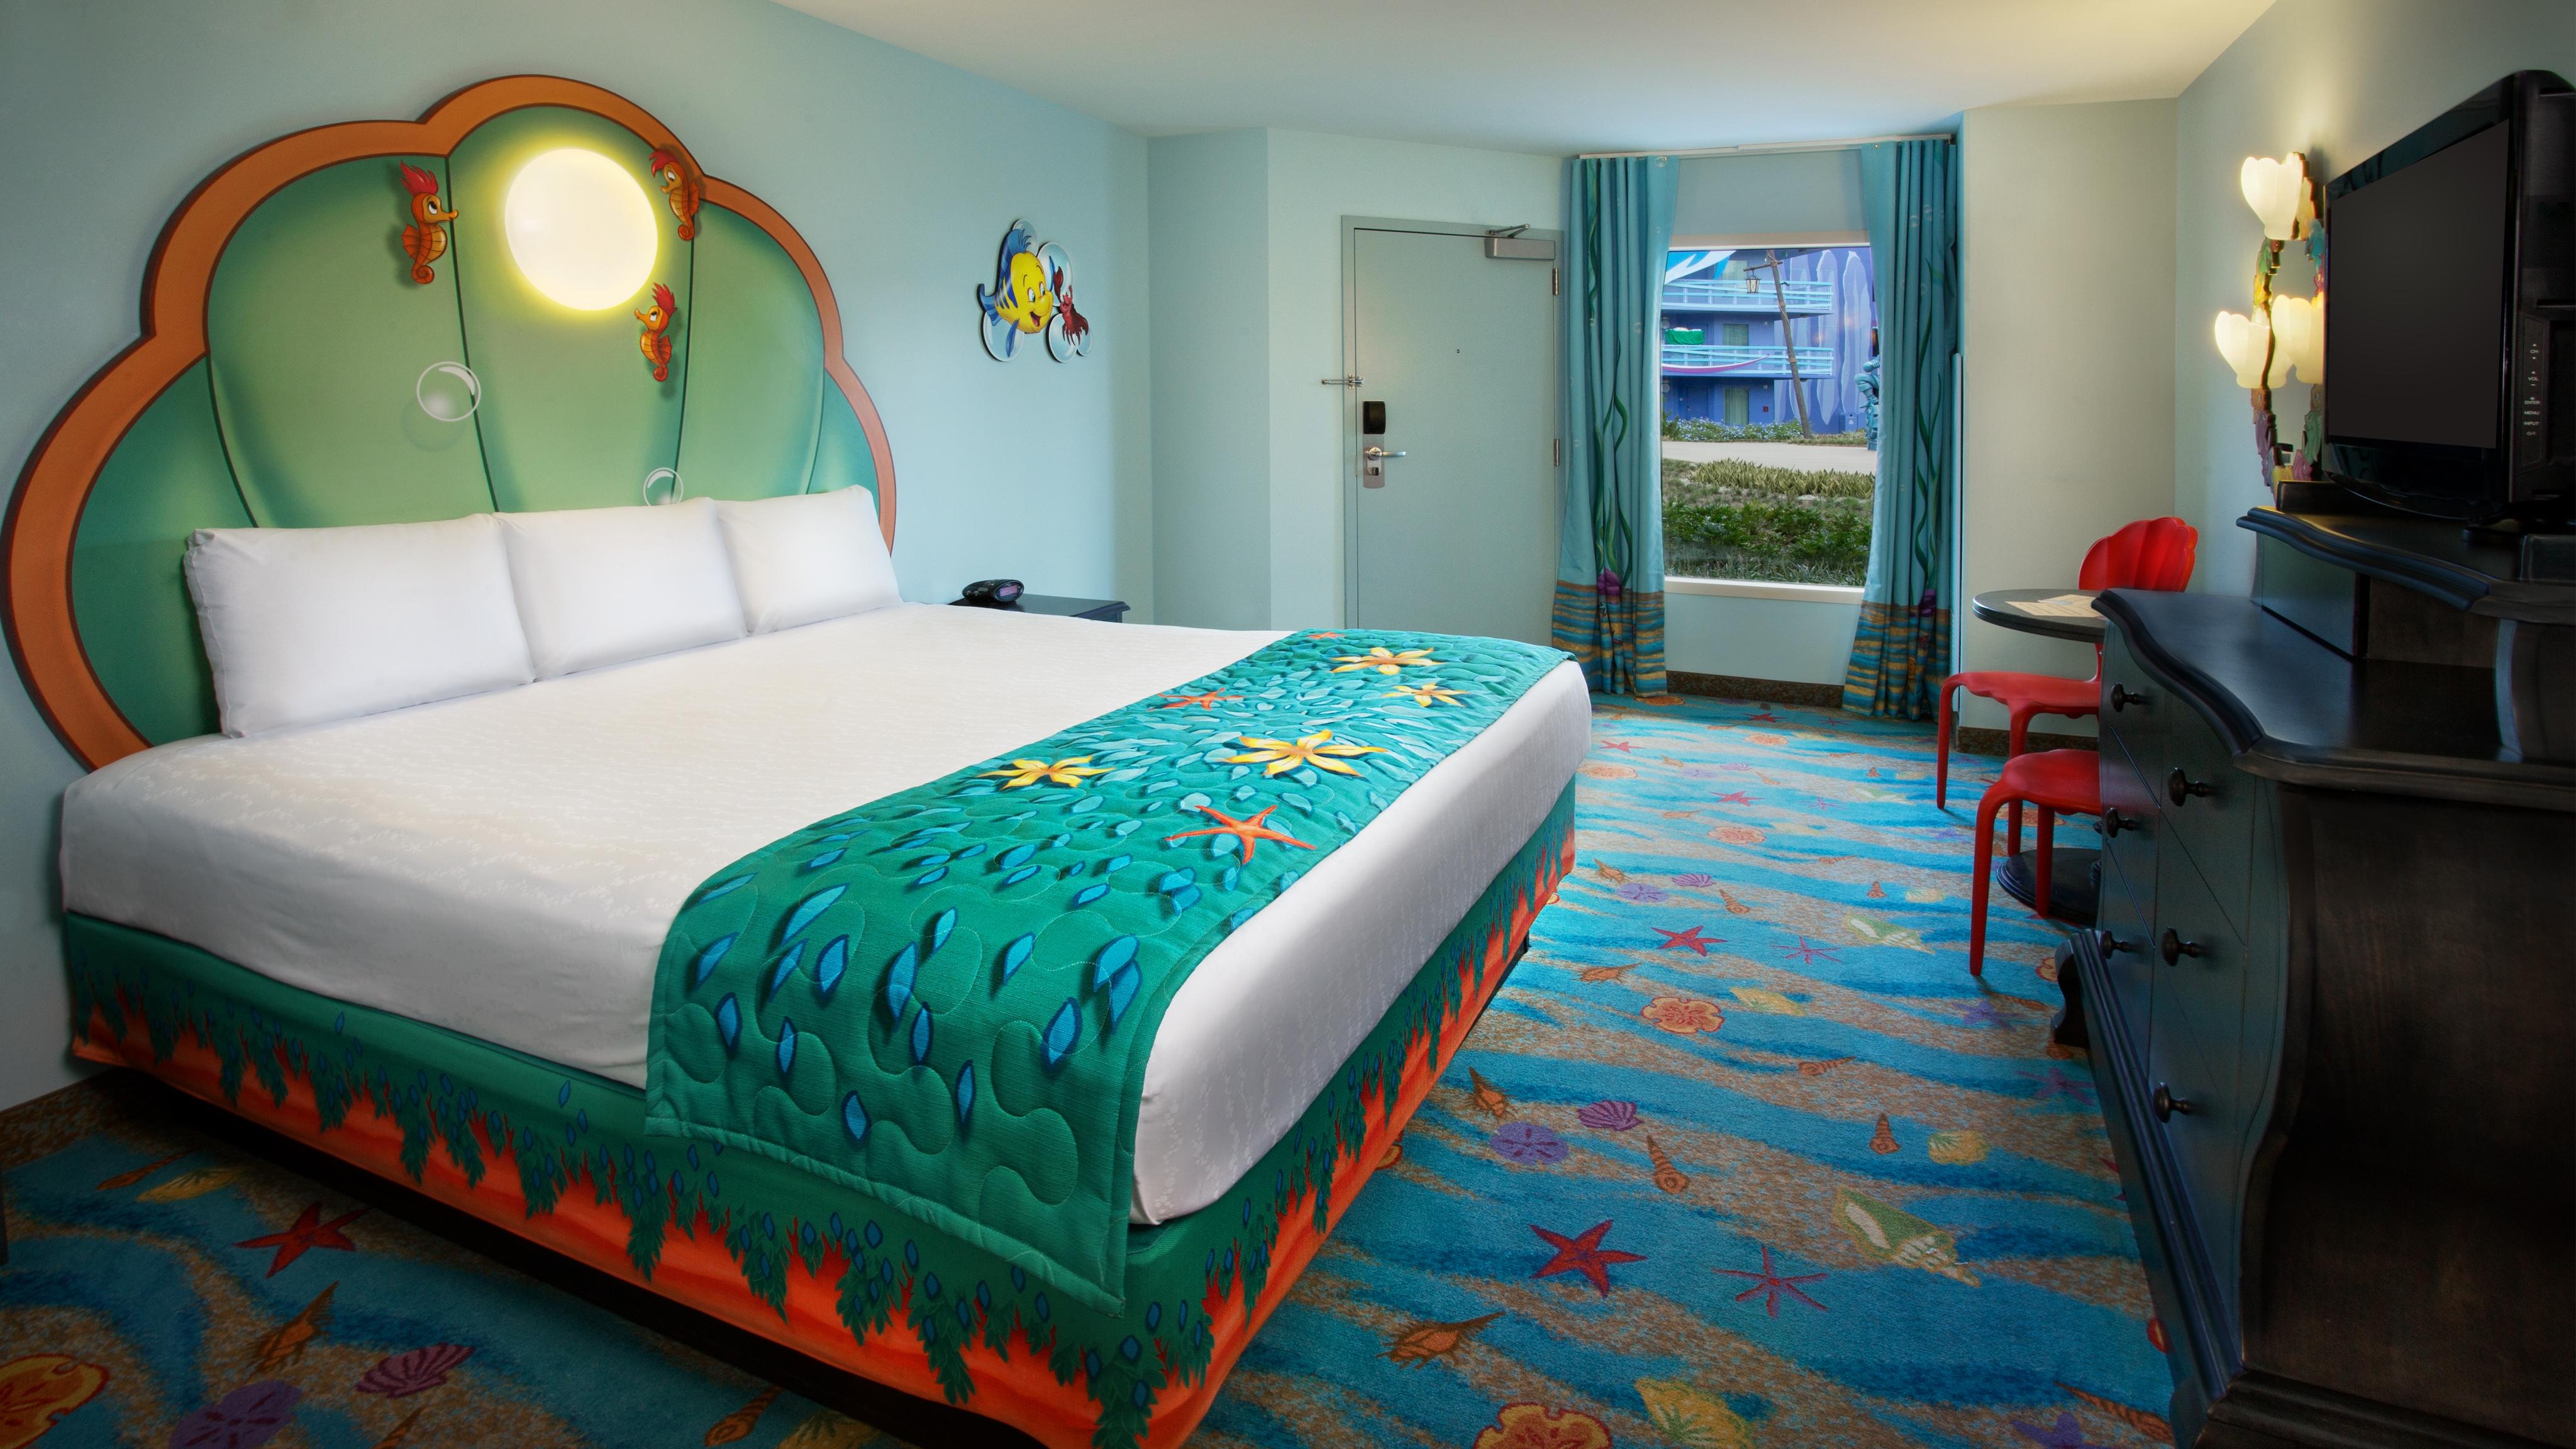 The Little Mermaid Standard Room | themeparkbeds.com